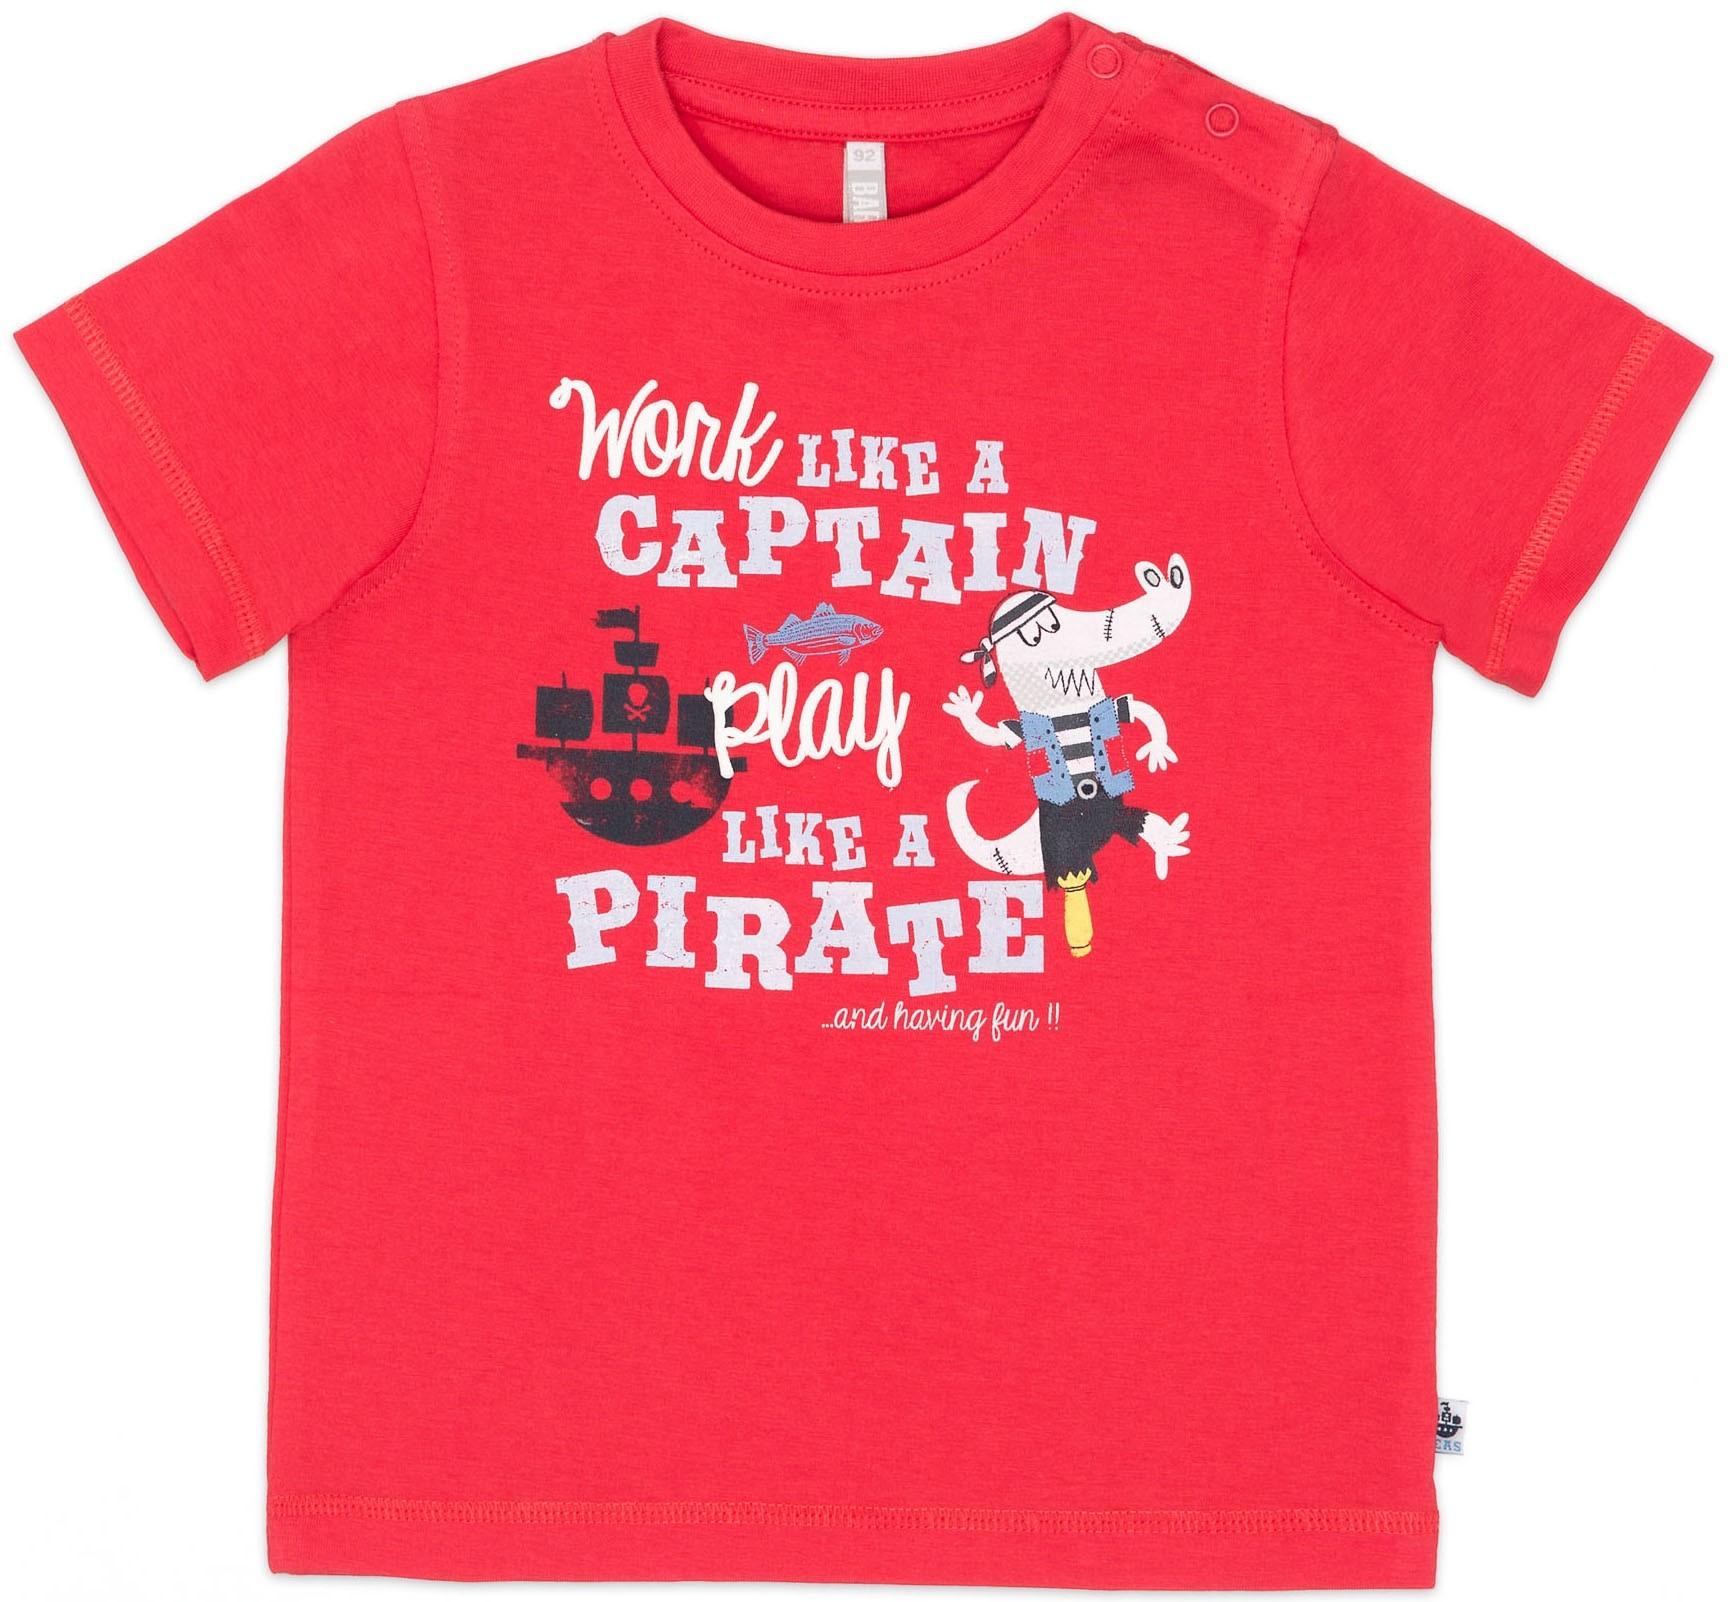 Футболки Barkito Футболка с коротким рукавом для мальчика Barkito, Пираты семи морей, красная